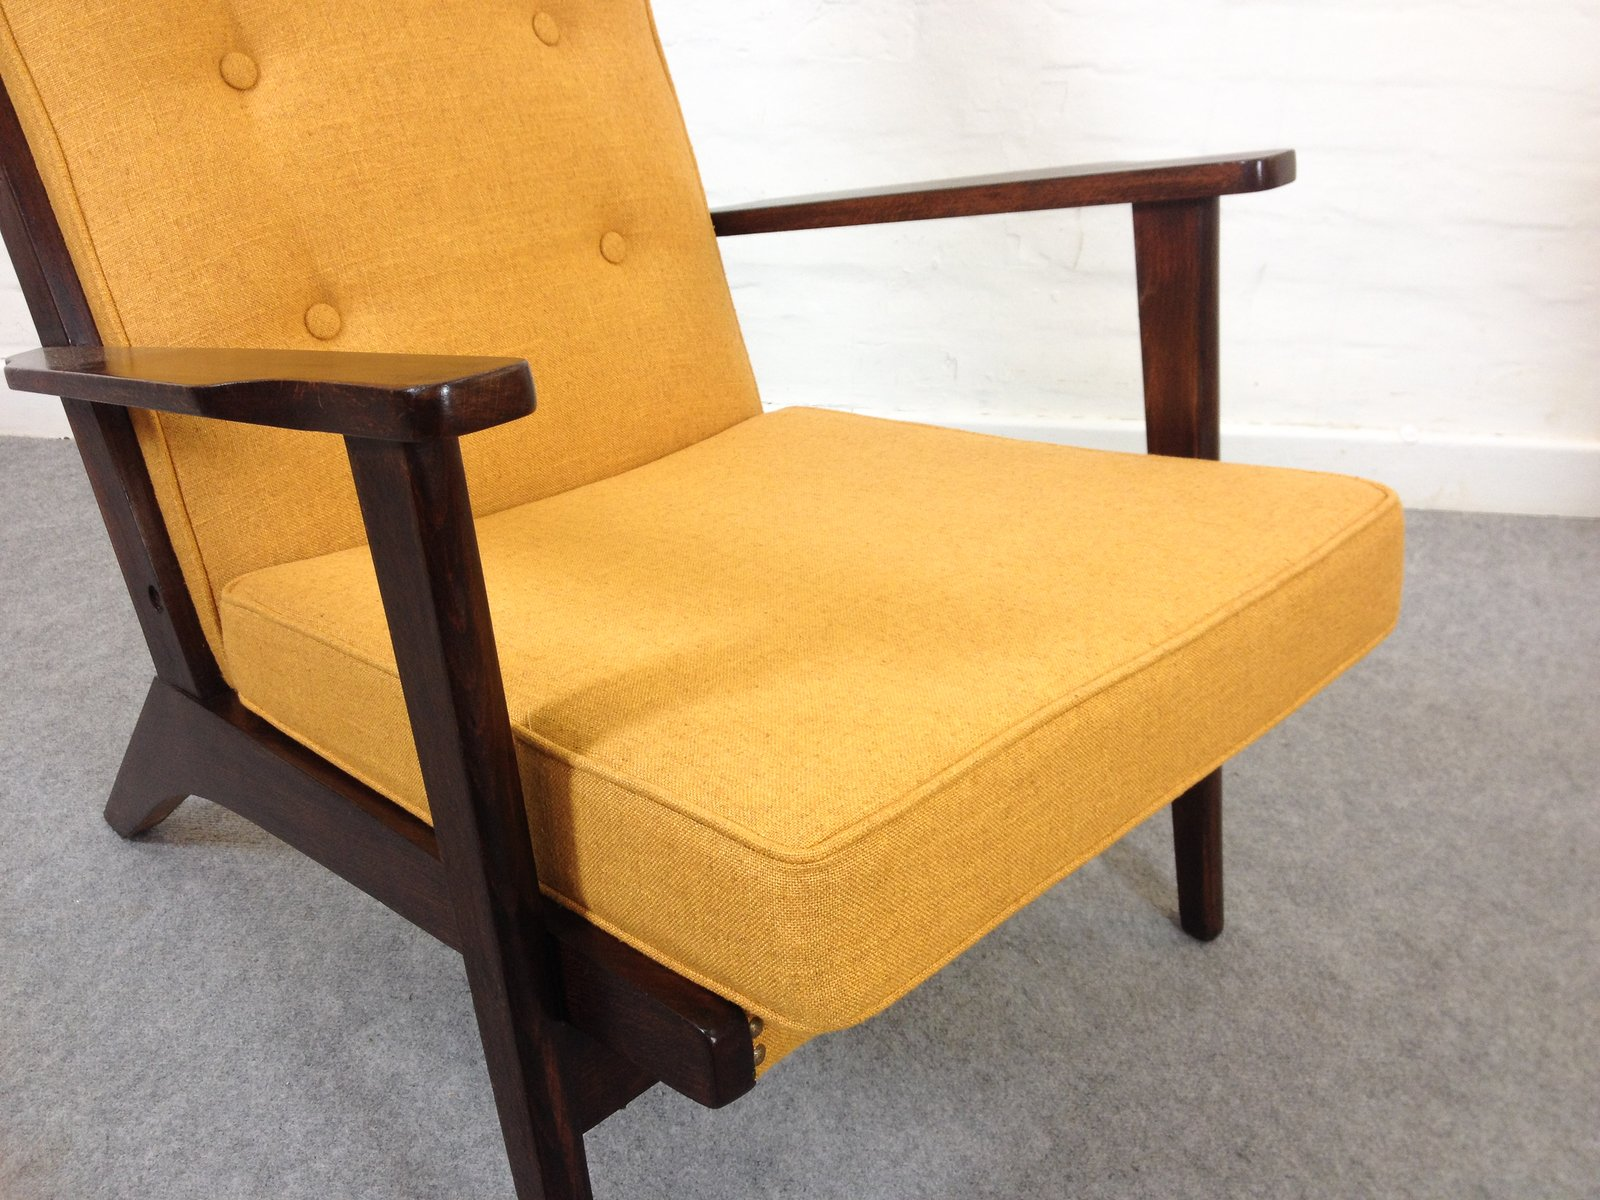 Mustard yellow furniture Yellow Decor Price Per Set Pamono Midcentury Mustard Yellow Lounge Chairs From Parker Knoll 1950s